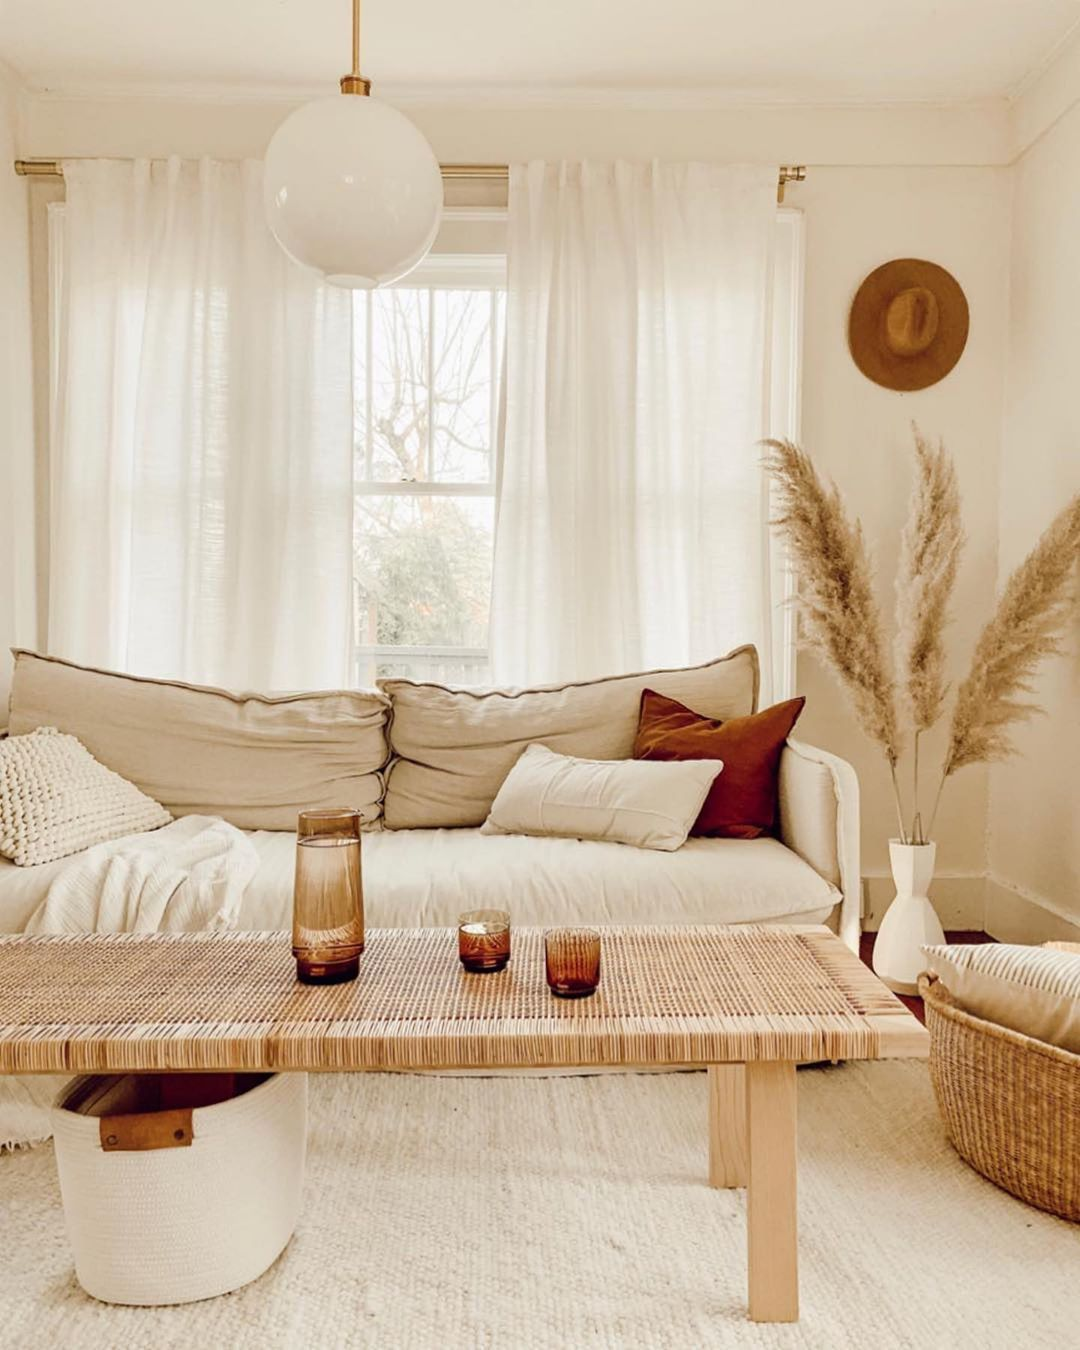 Dreamy Interiors Via Ezzwilson Follow Our Pinterest Page